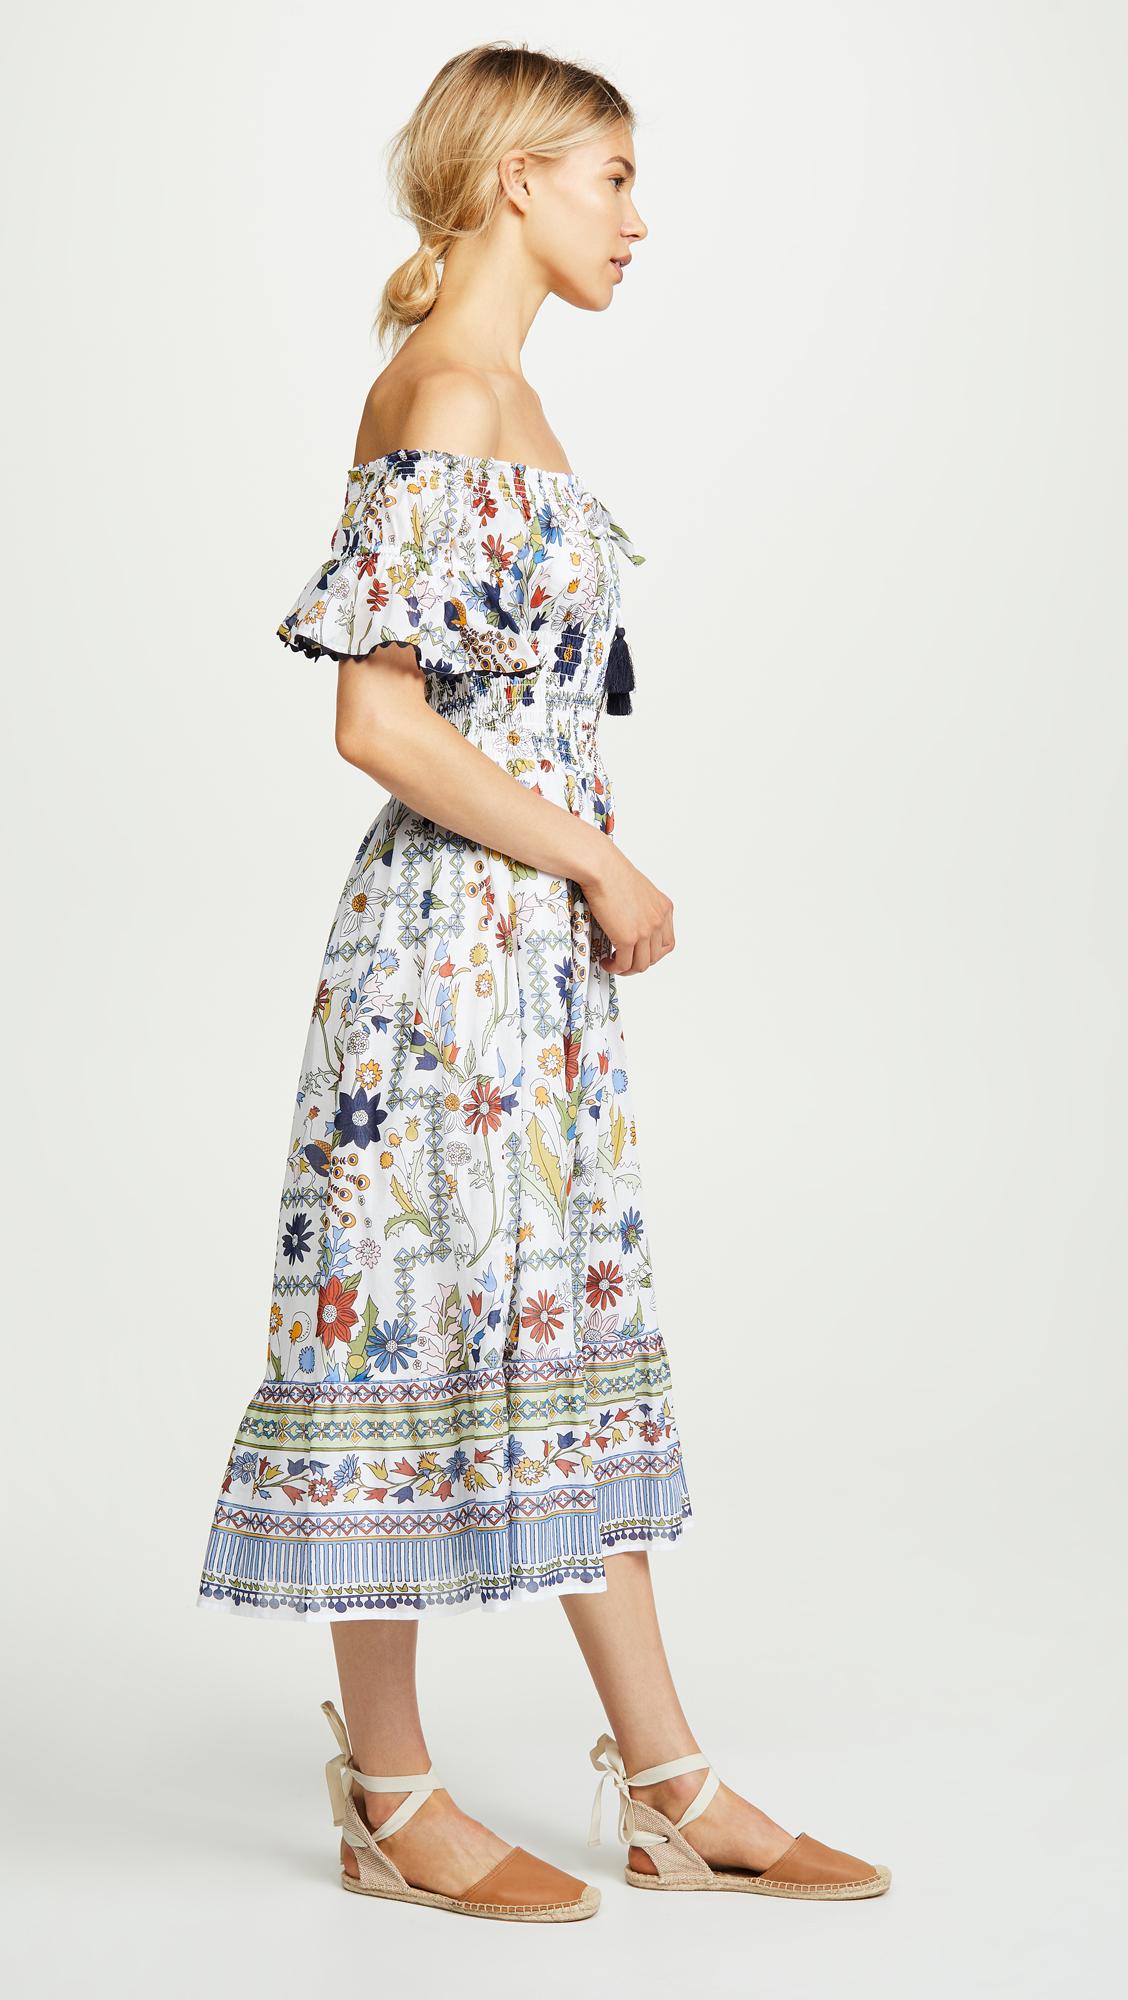 c17569f3e5 Tory Burch Meadow Folly Dress | SHOPBOP